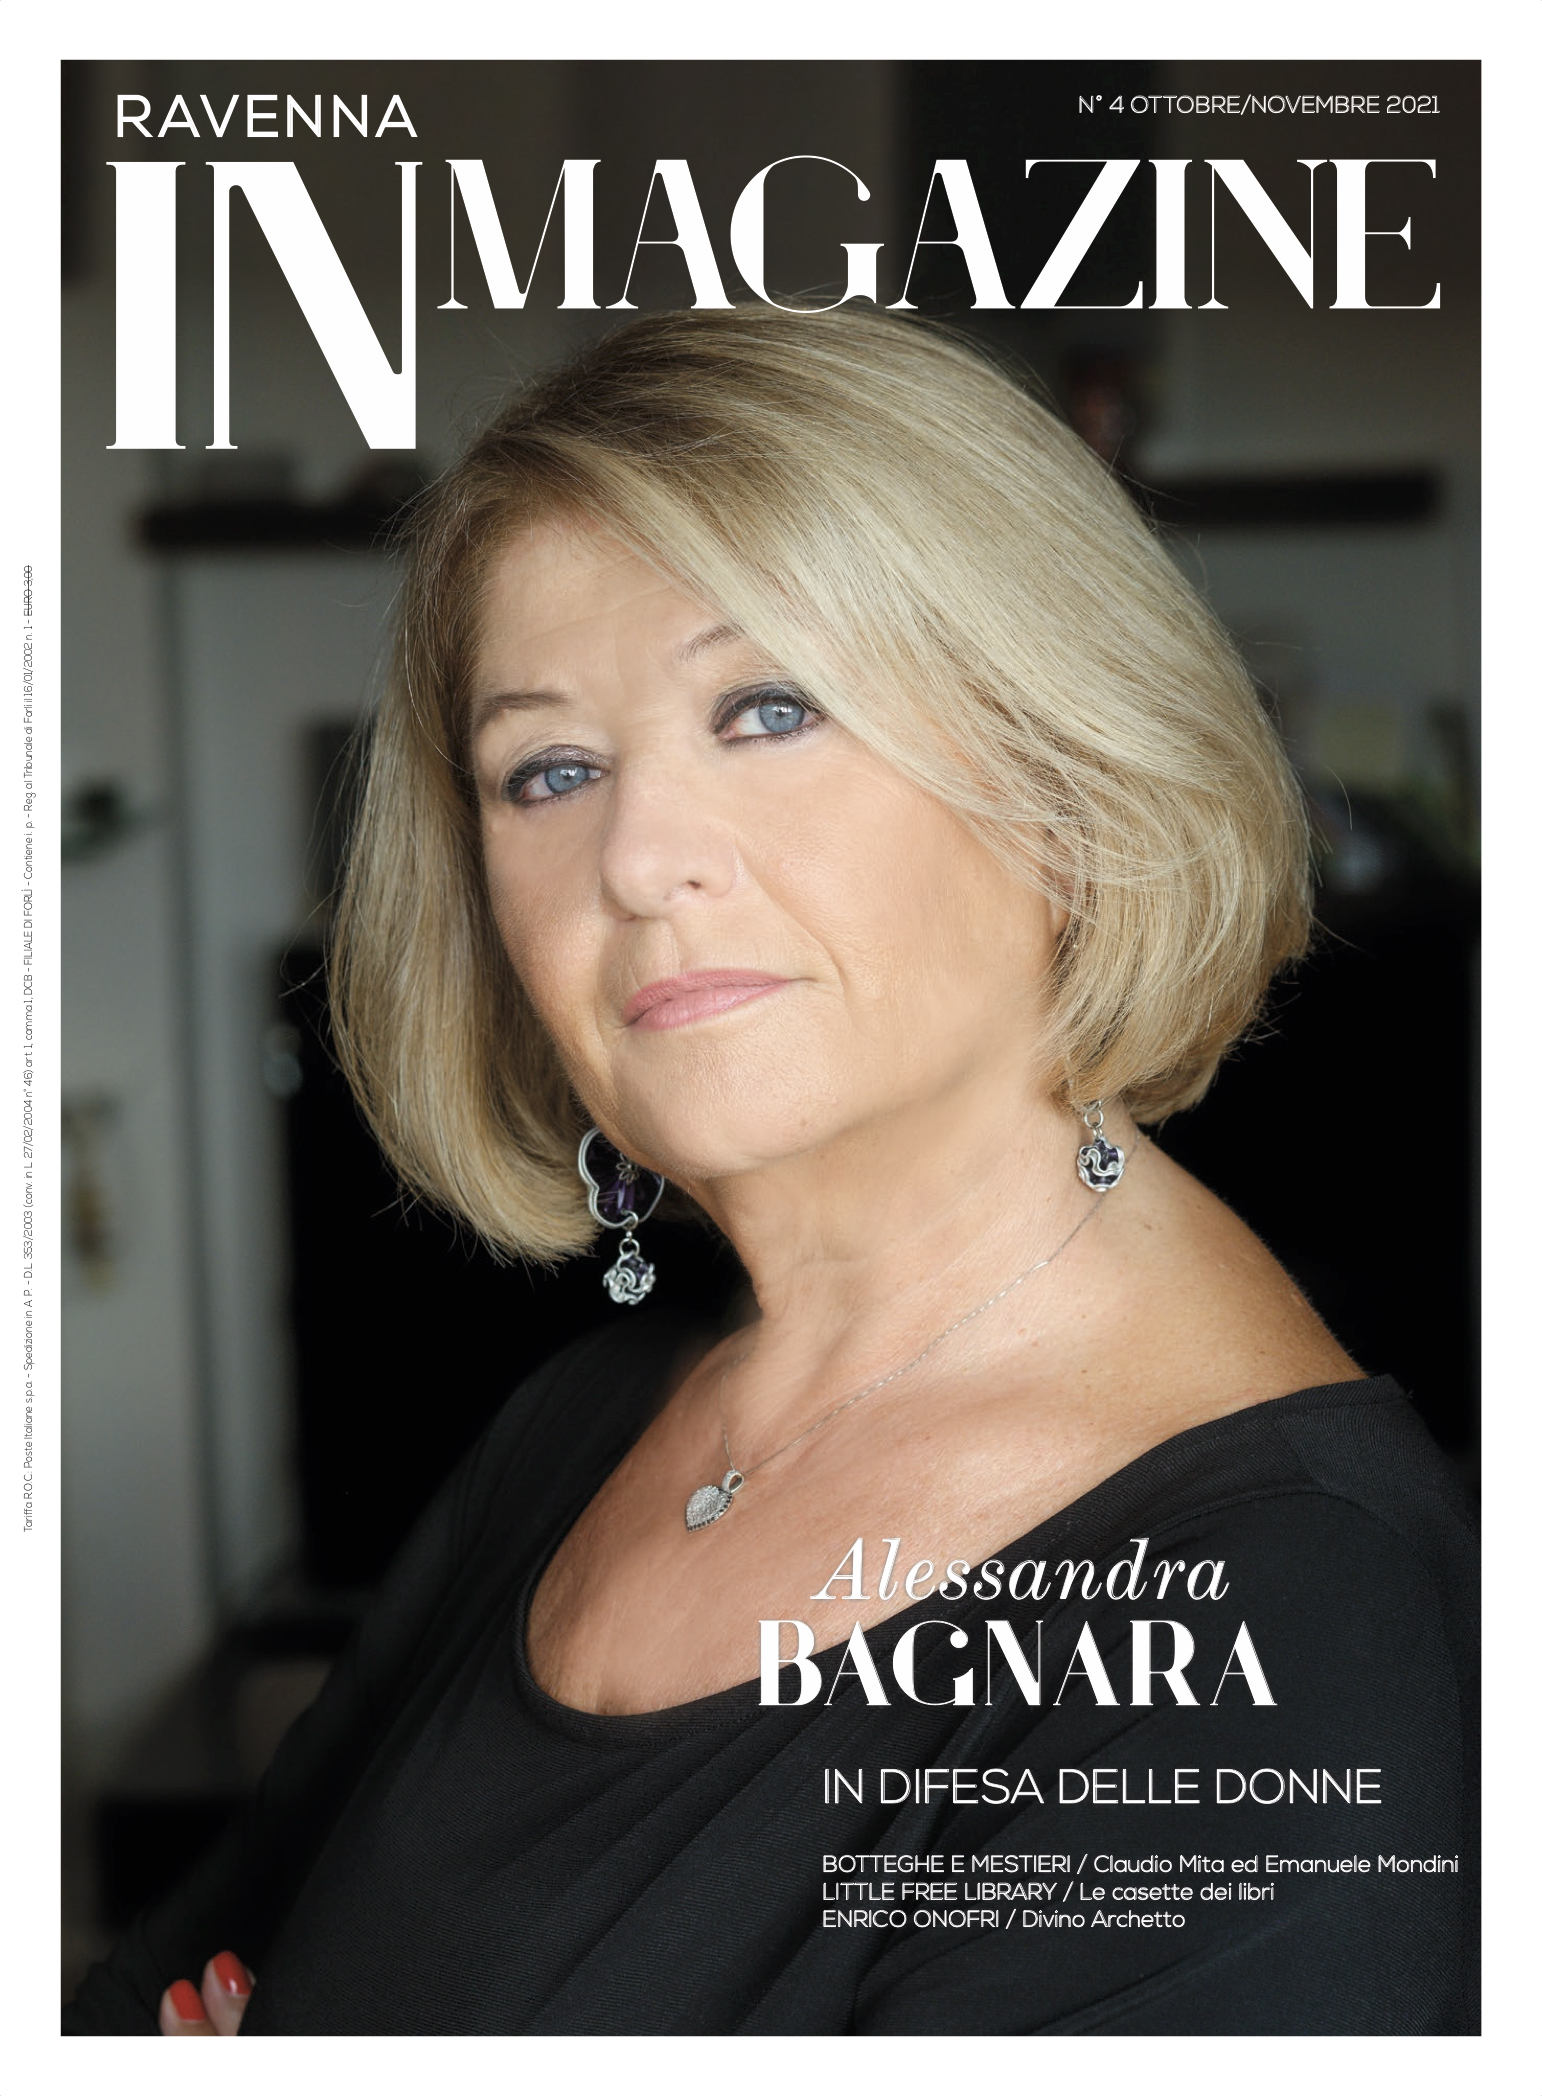 Ravenna IN Magazine 04-2021: in copertina, Alessandra Bagnara